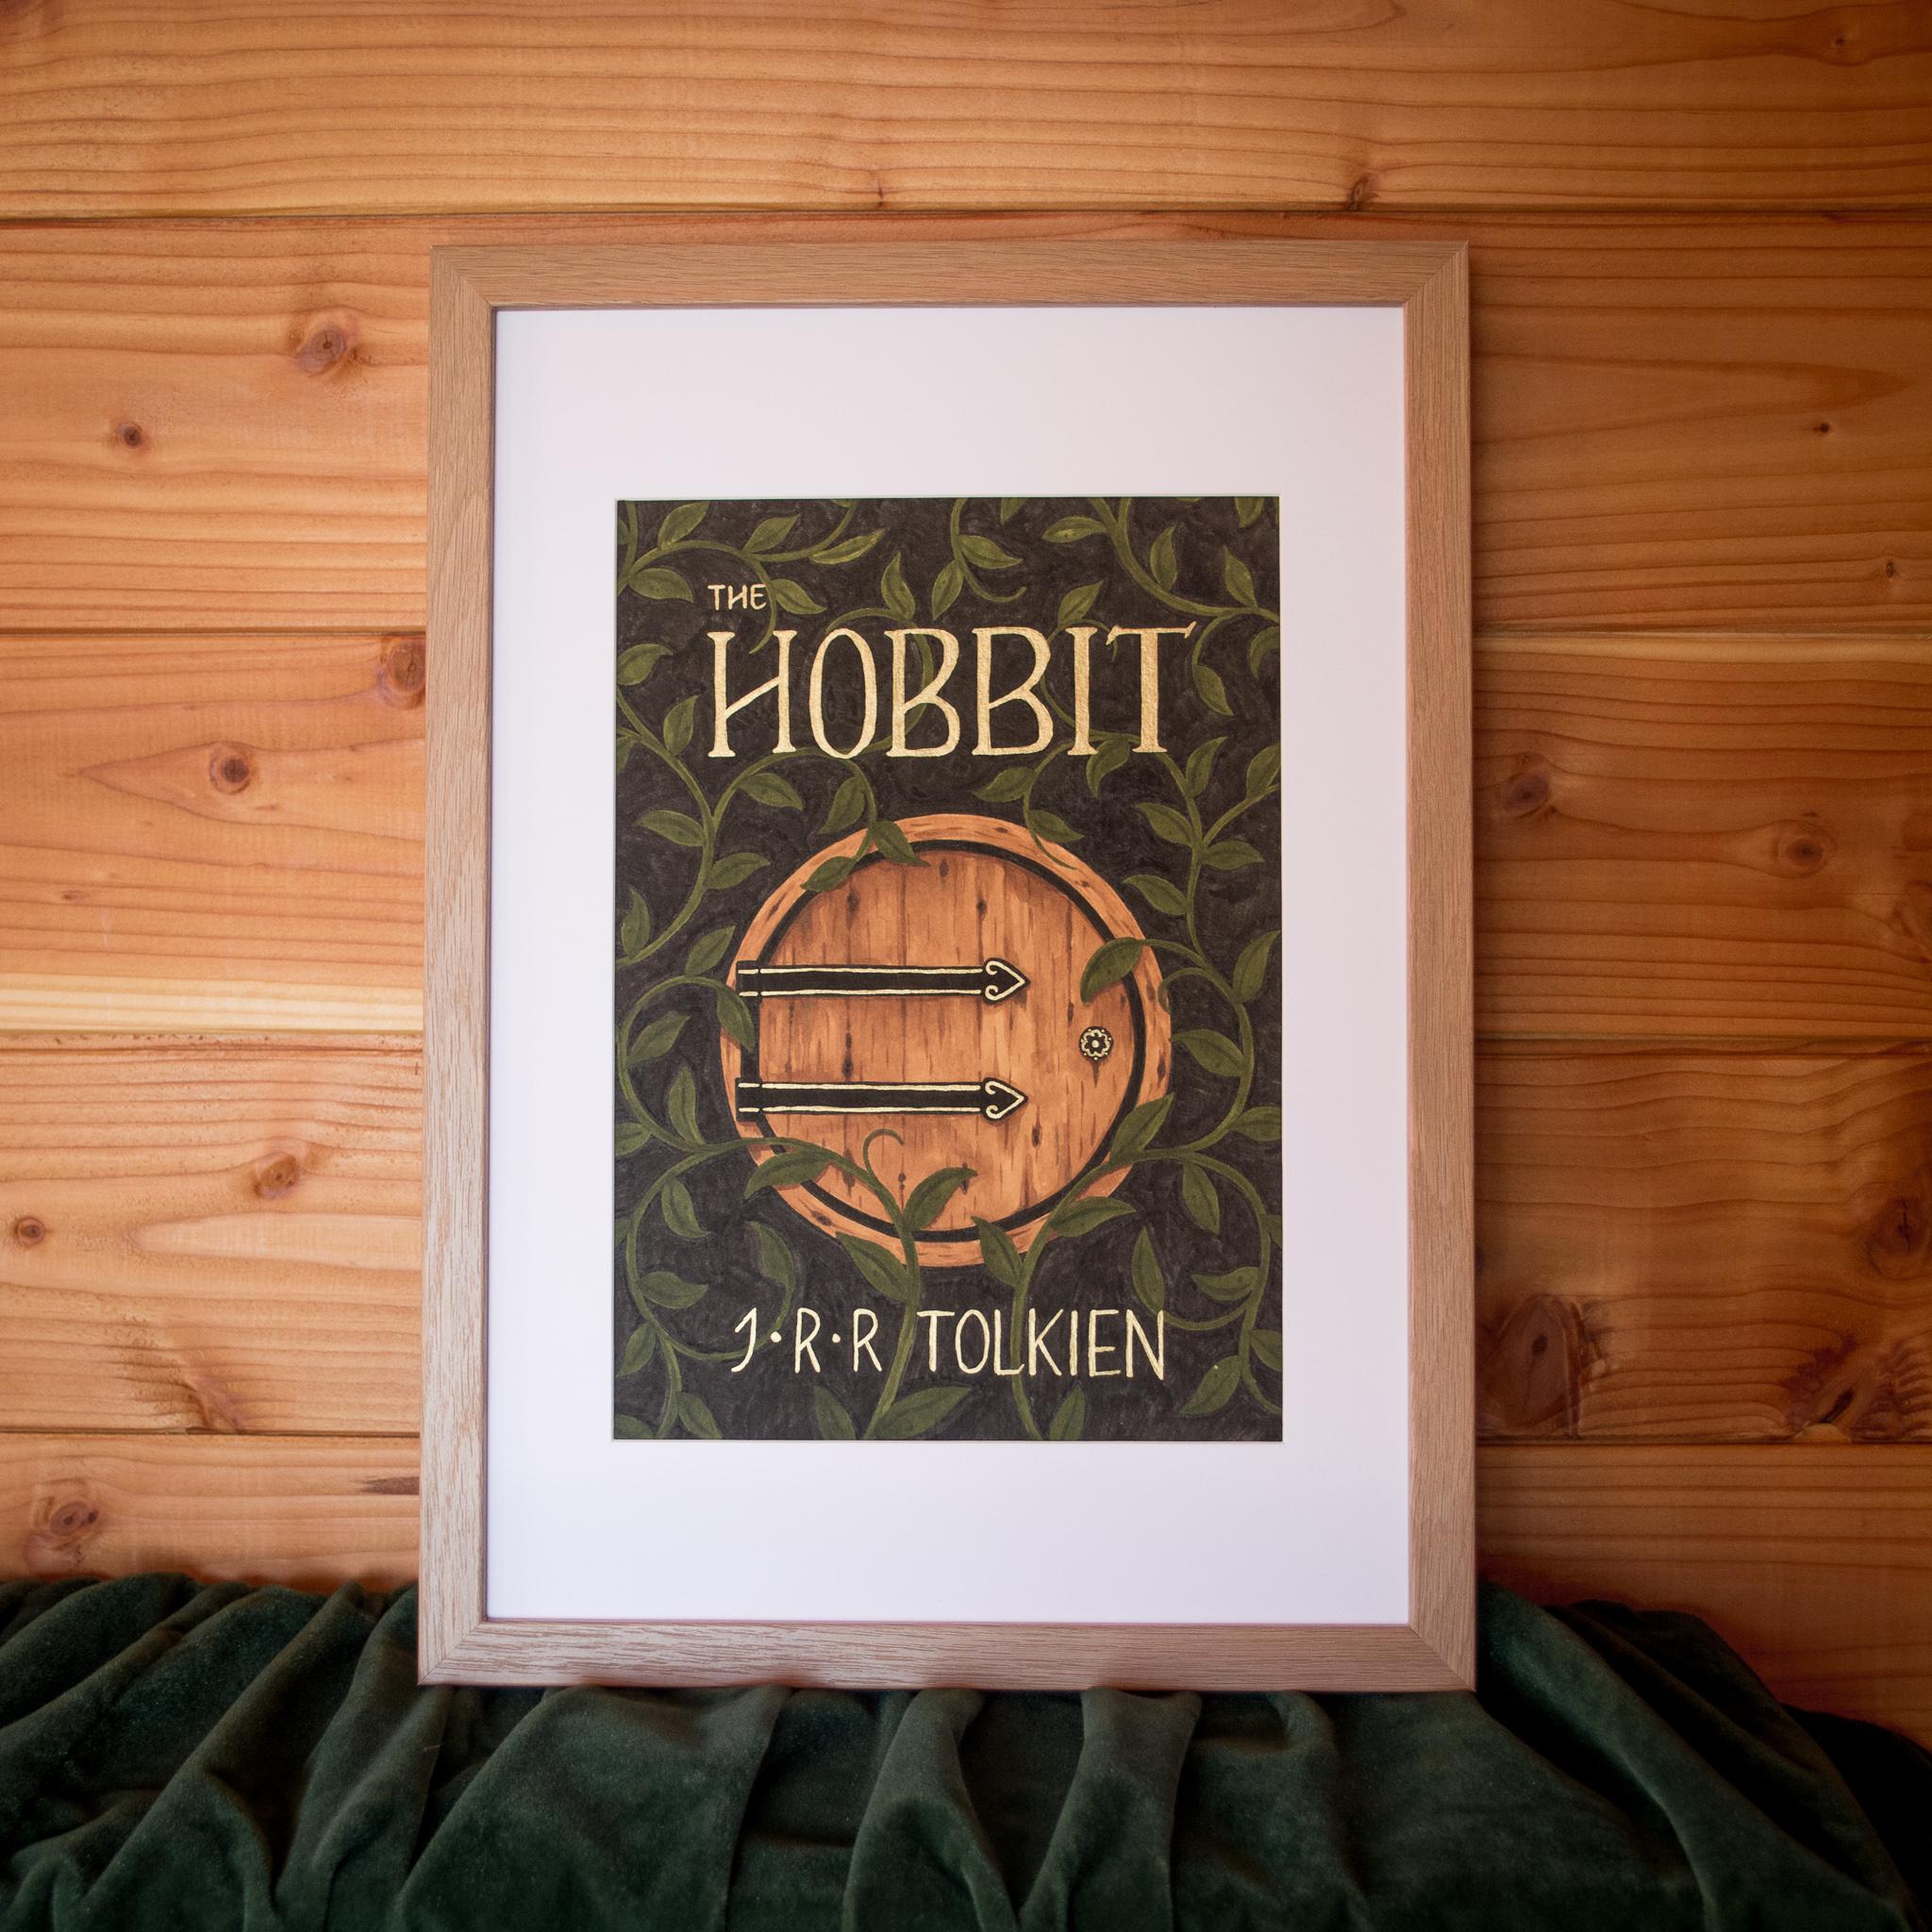 hobbit_book_cover_holly_dunn_design.jpg